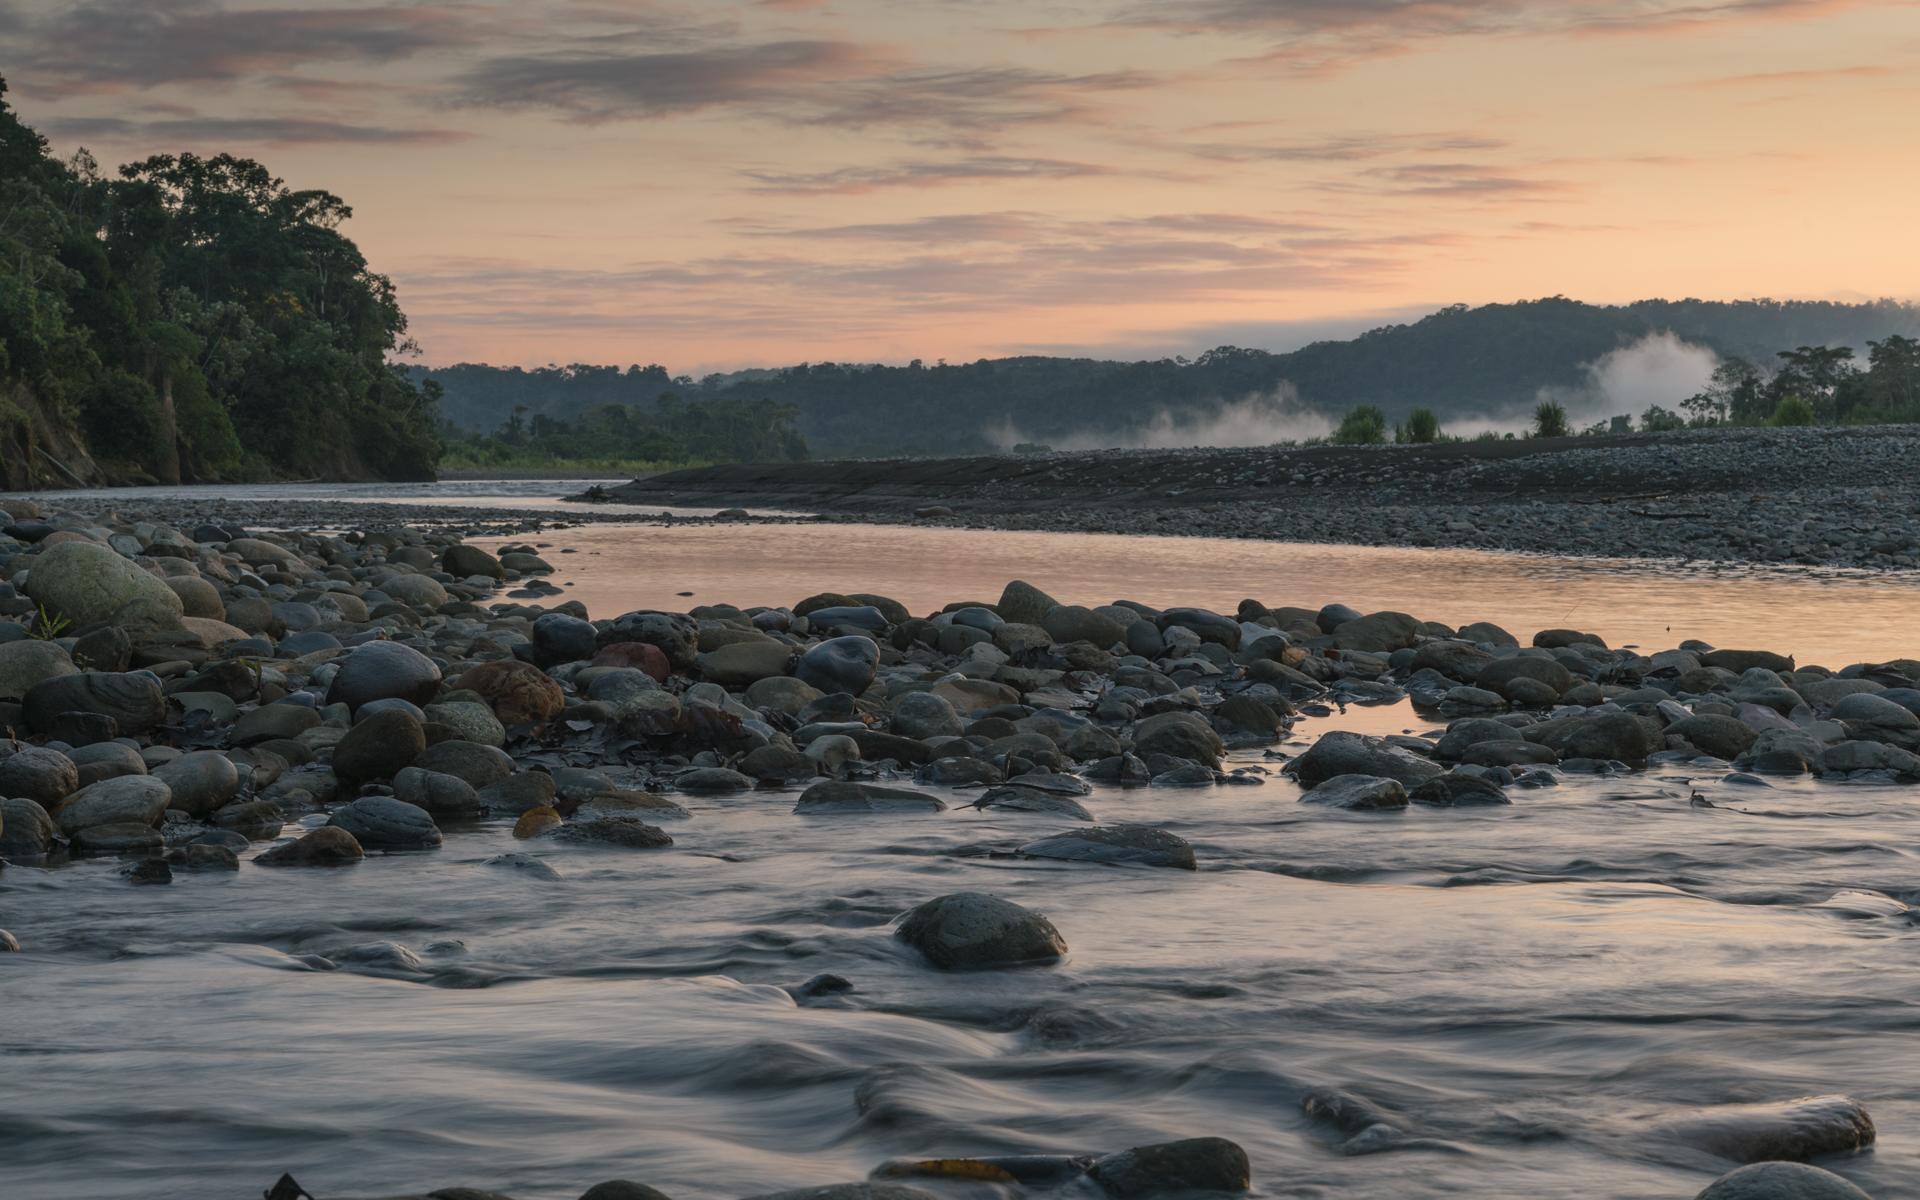 Sunrise reflecting on the Alto Madre de Dios River